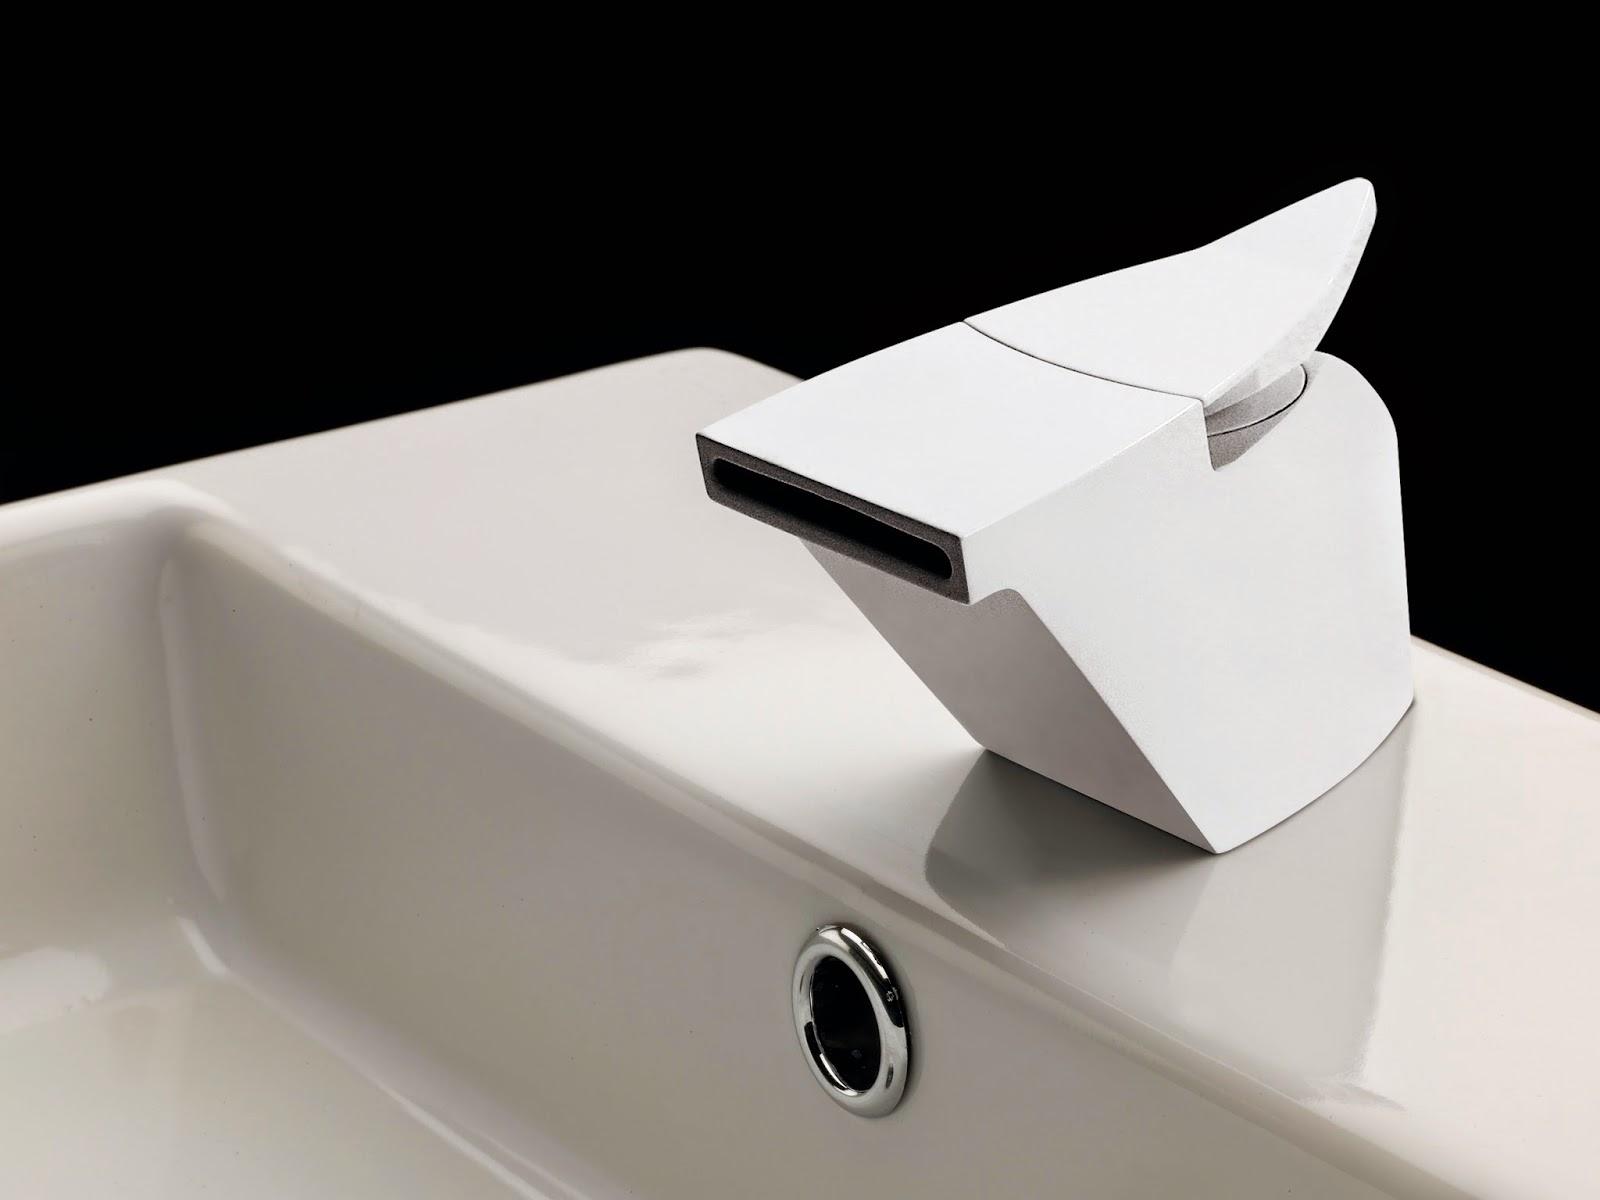 Griferia Vidrio Cascada Para Baño Diseno Elegancia:Decoración Fácil: Un baño de estética moderna y vanguardista o